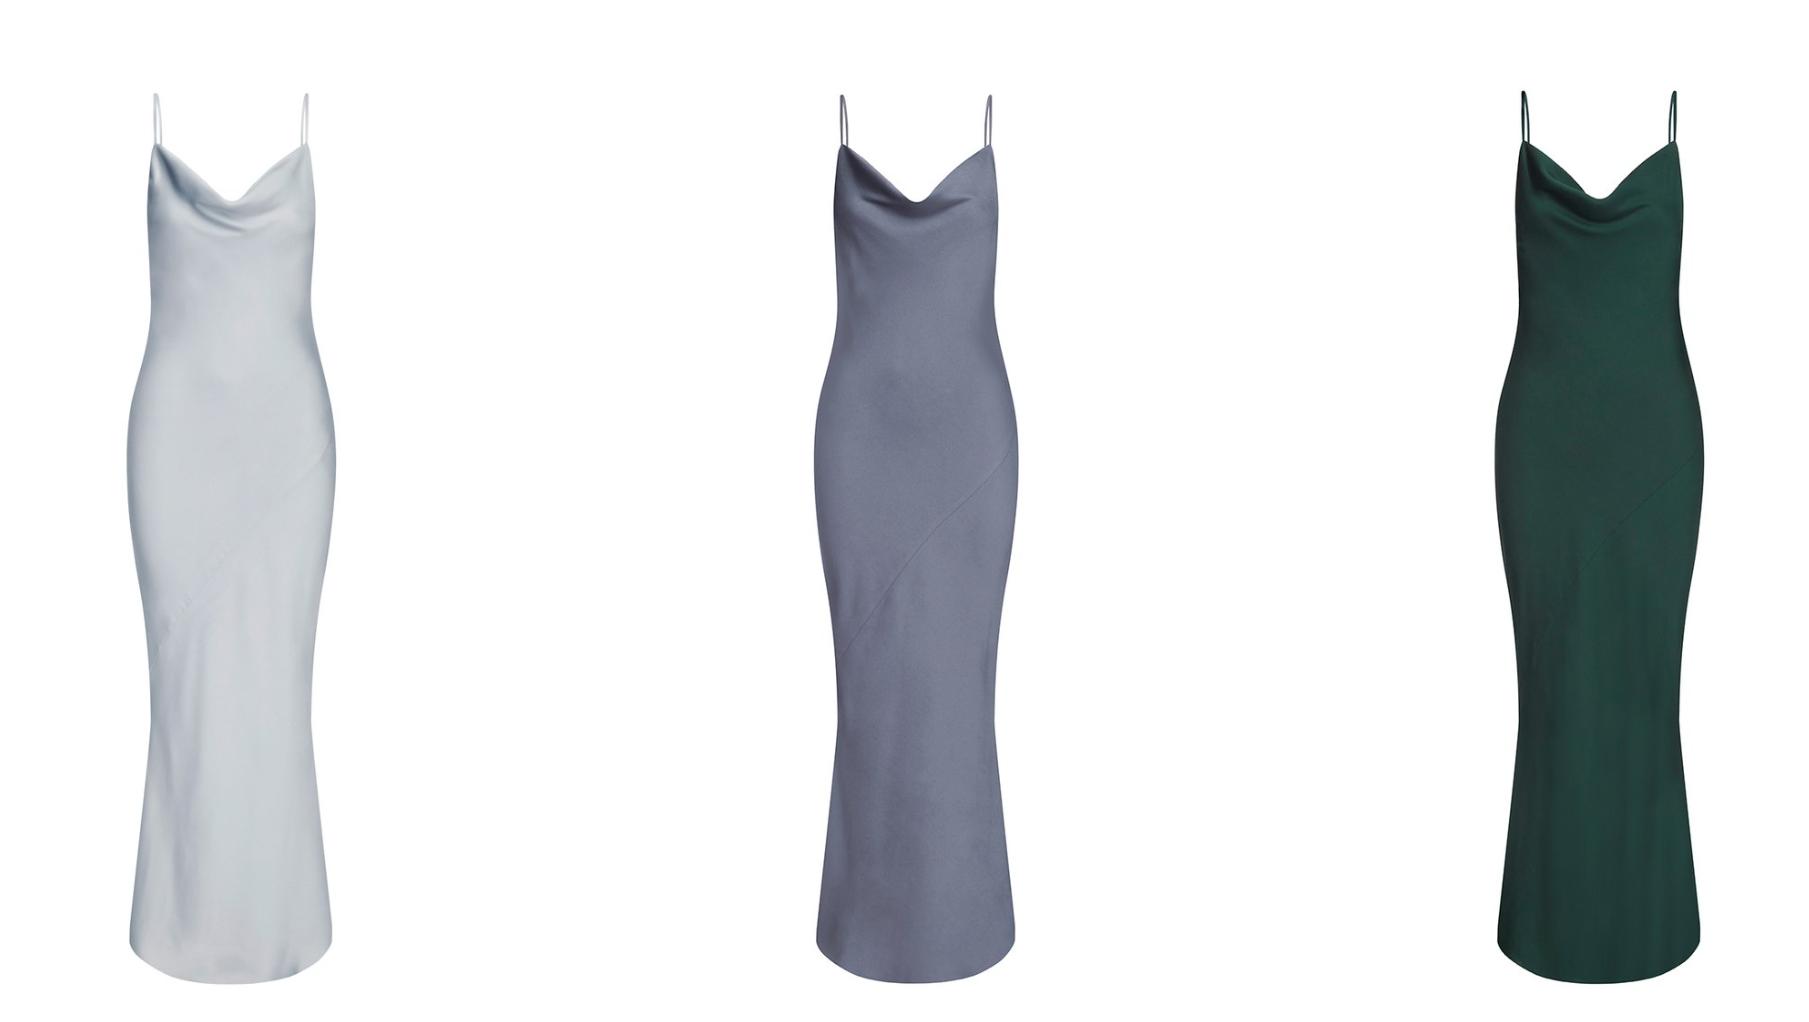 LUXE BIAS COWL SLIP DRESS - Shona Joy featured on LOVE FIND CO.